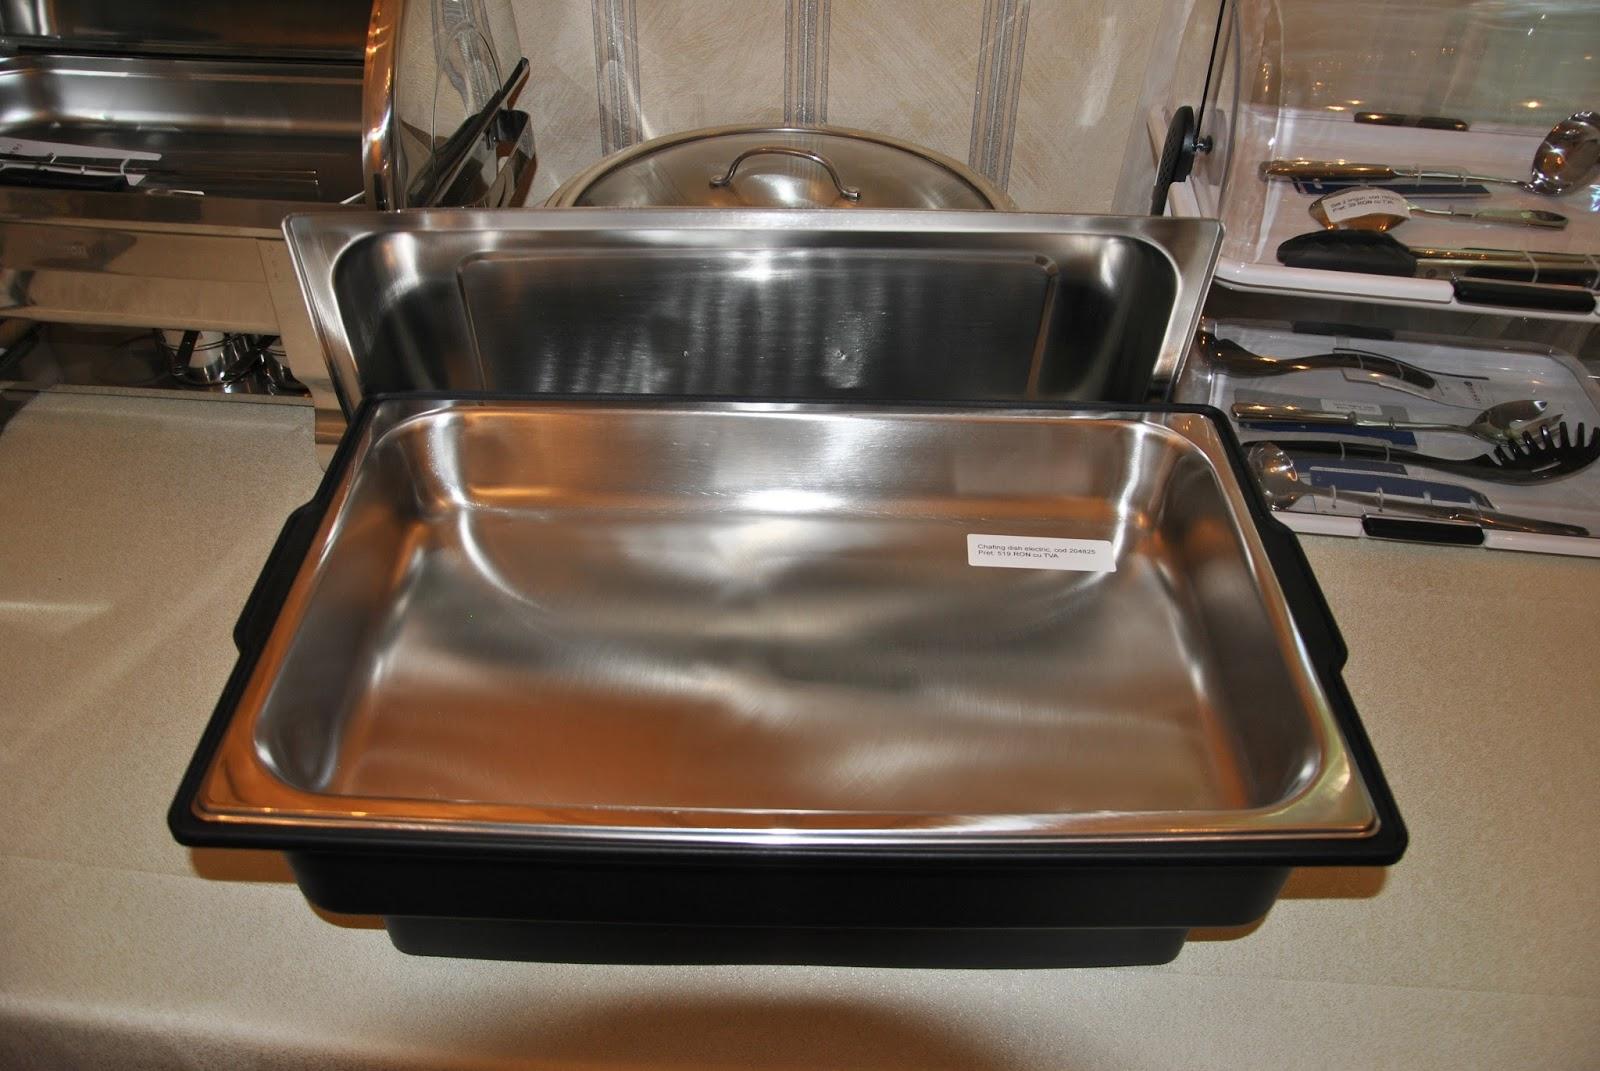 Chafing Dish Electric Dreptunghiular, GN 1/1, Pret Vase Incalzitoare Mancare, Profesionale Horeca, Echipamente Bufet, Masa